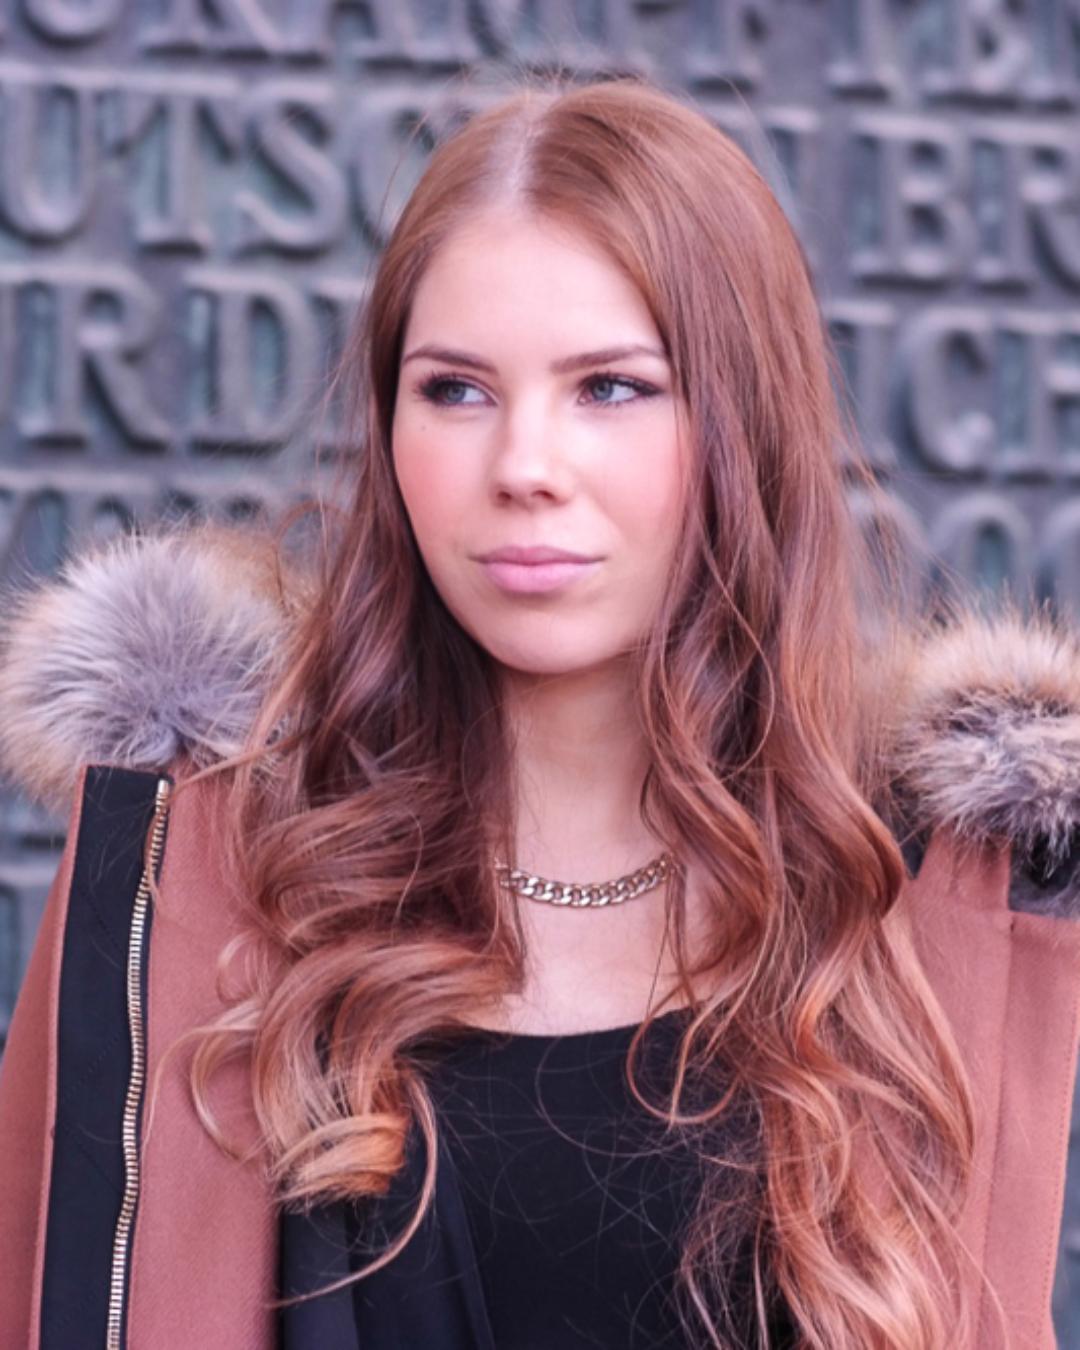 Outfit: Camel farbener Mantel – Odeonsplatz München